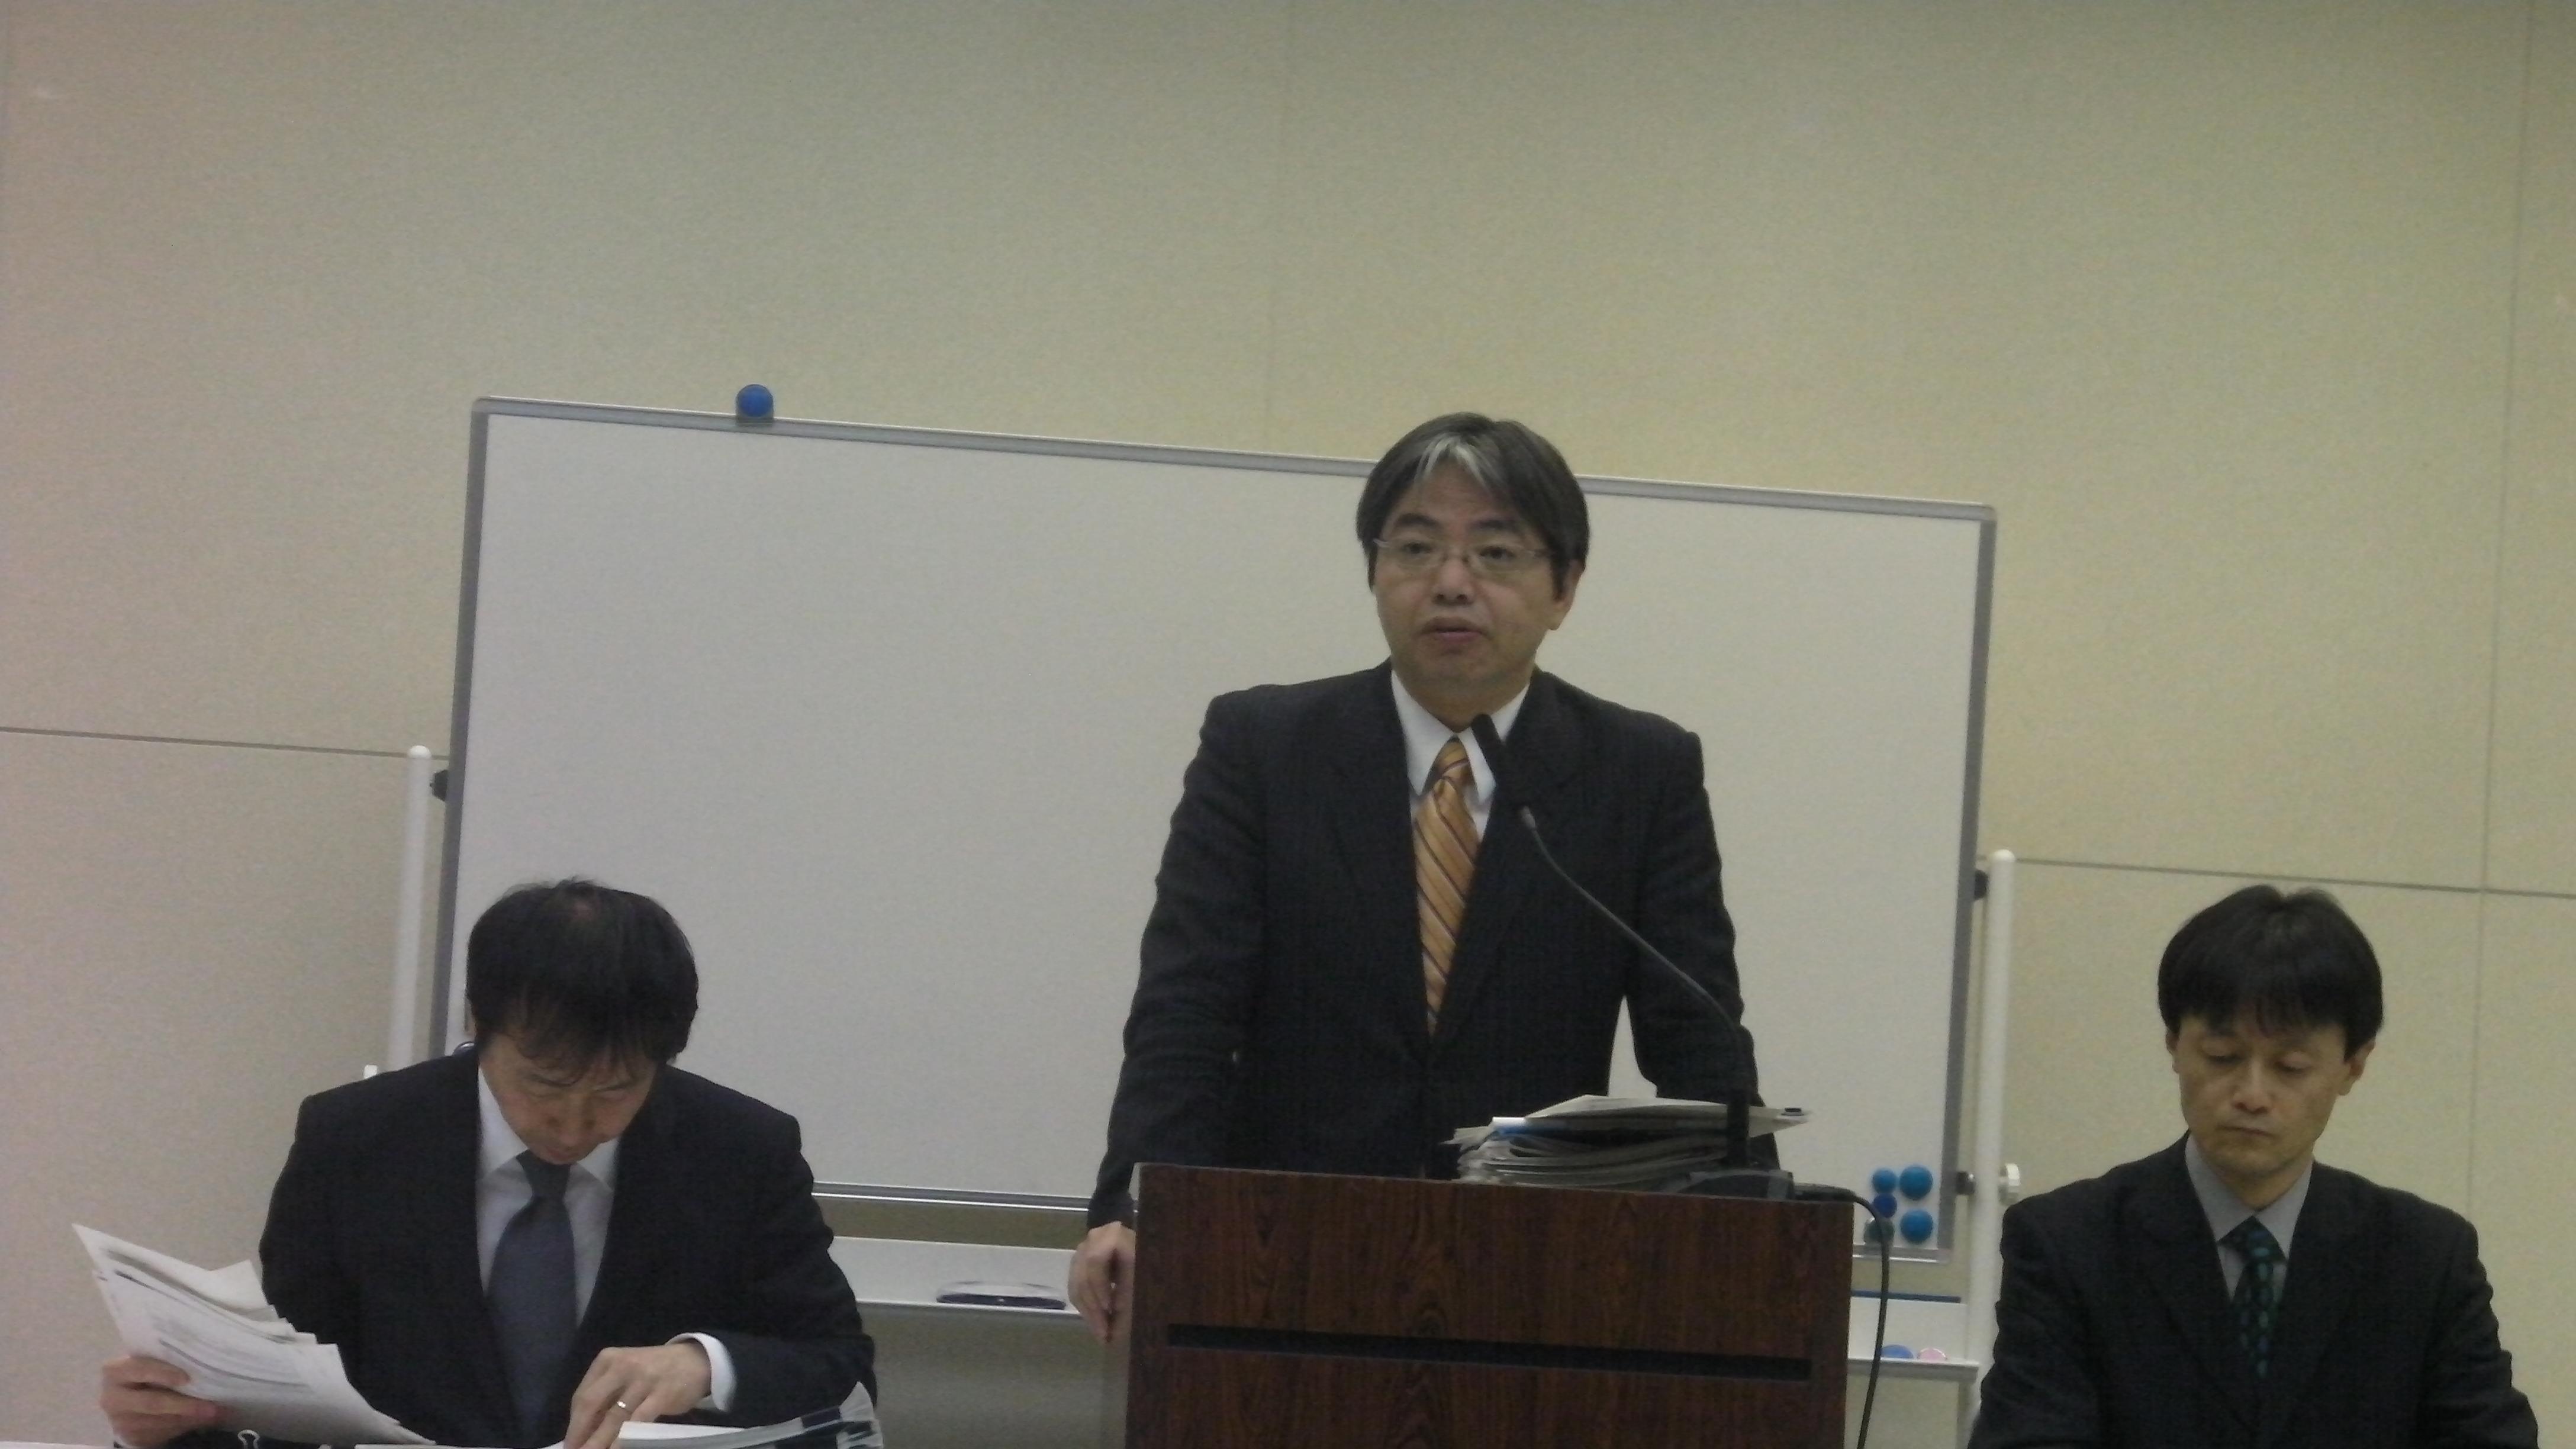 http://daily.magazine9.jp/m9/oshidori/SANY0085.JPG